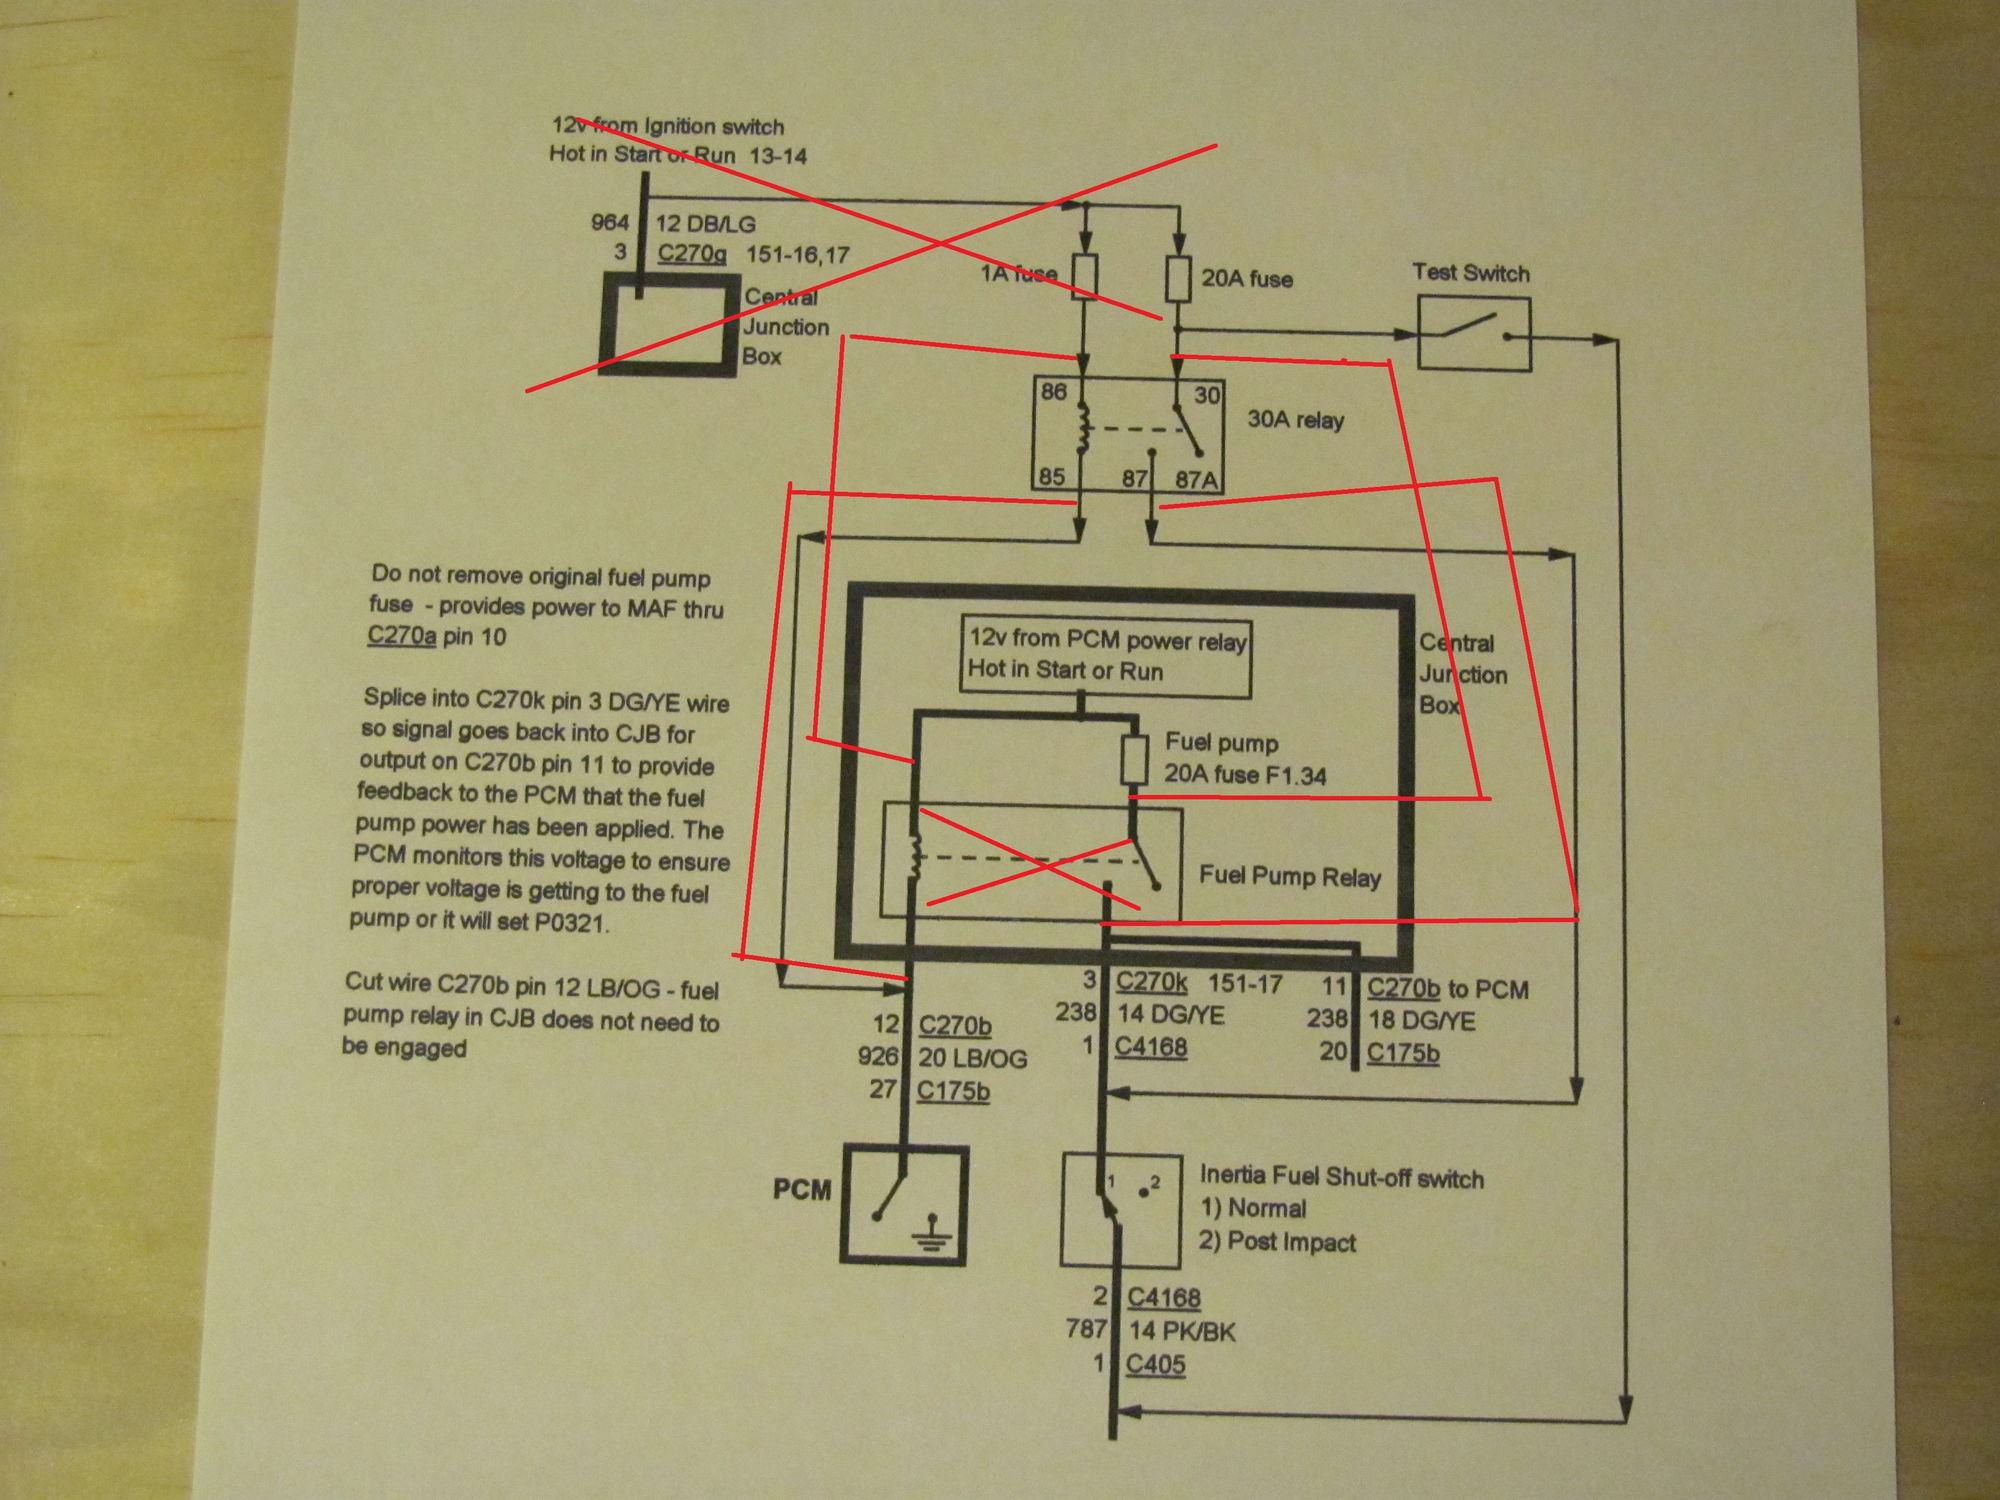 Fein 2000 Ford Mustang Kraftstoffpumpe Schaltplan Galerie - Der ...